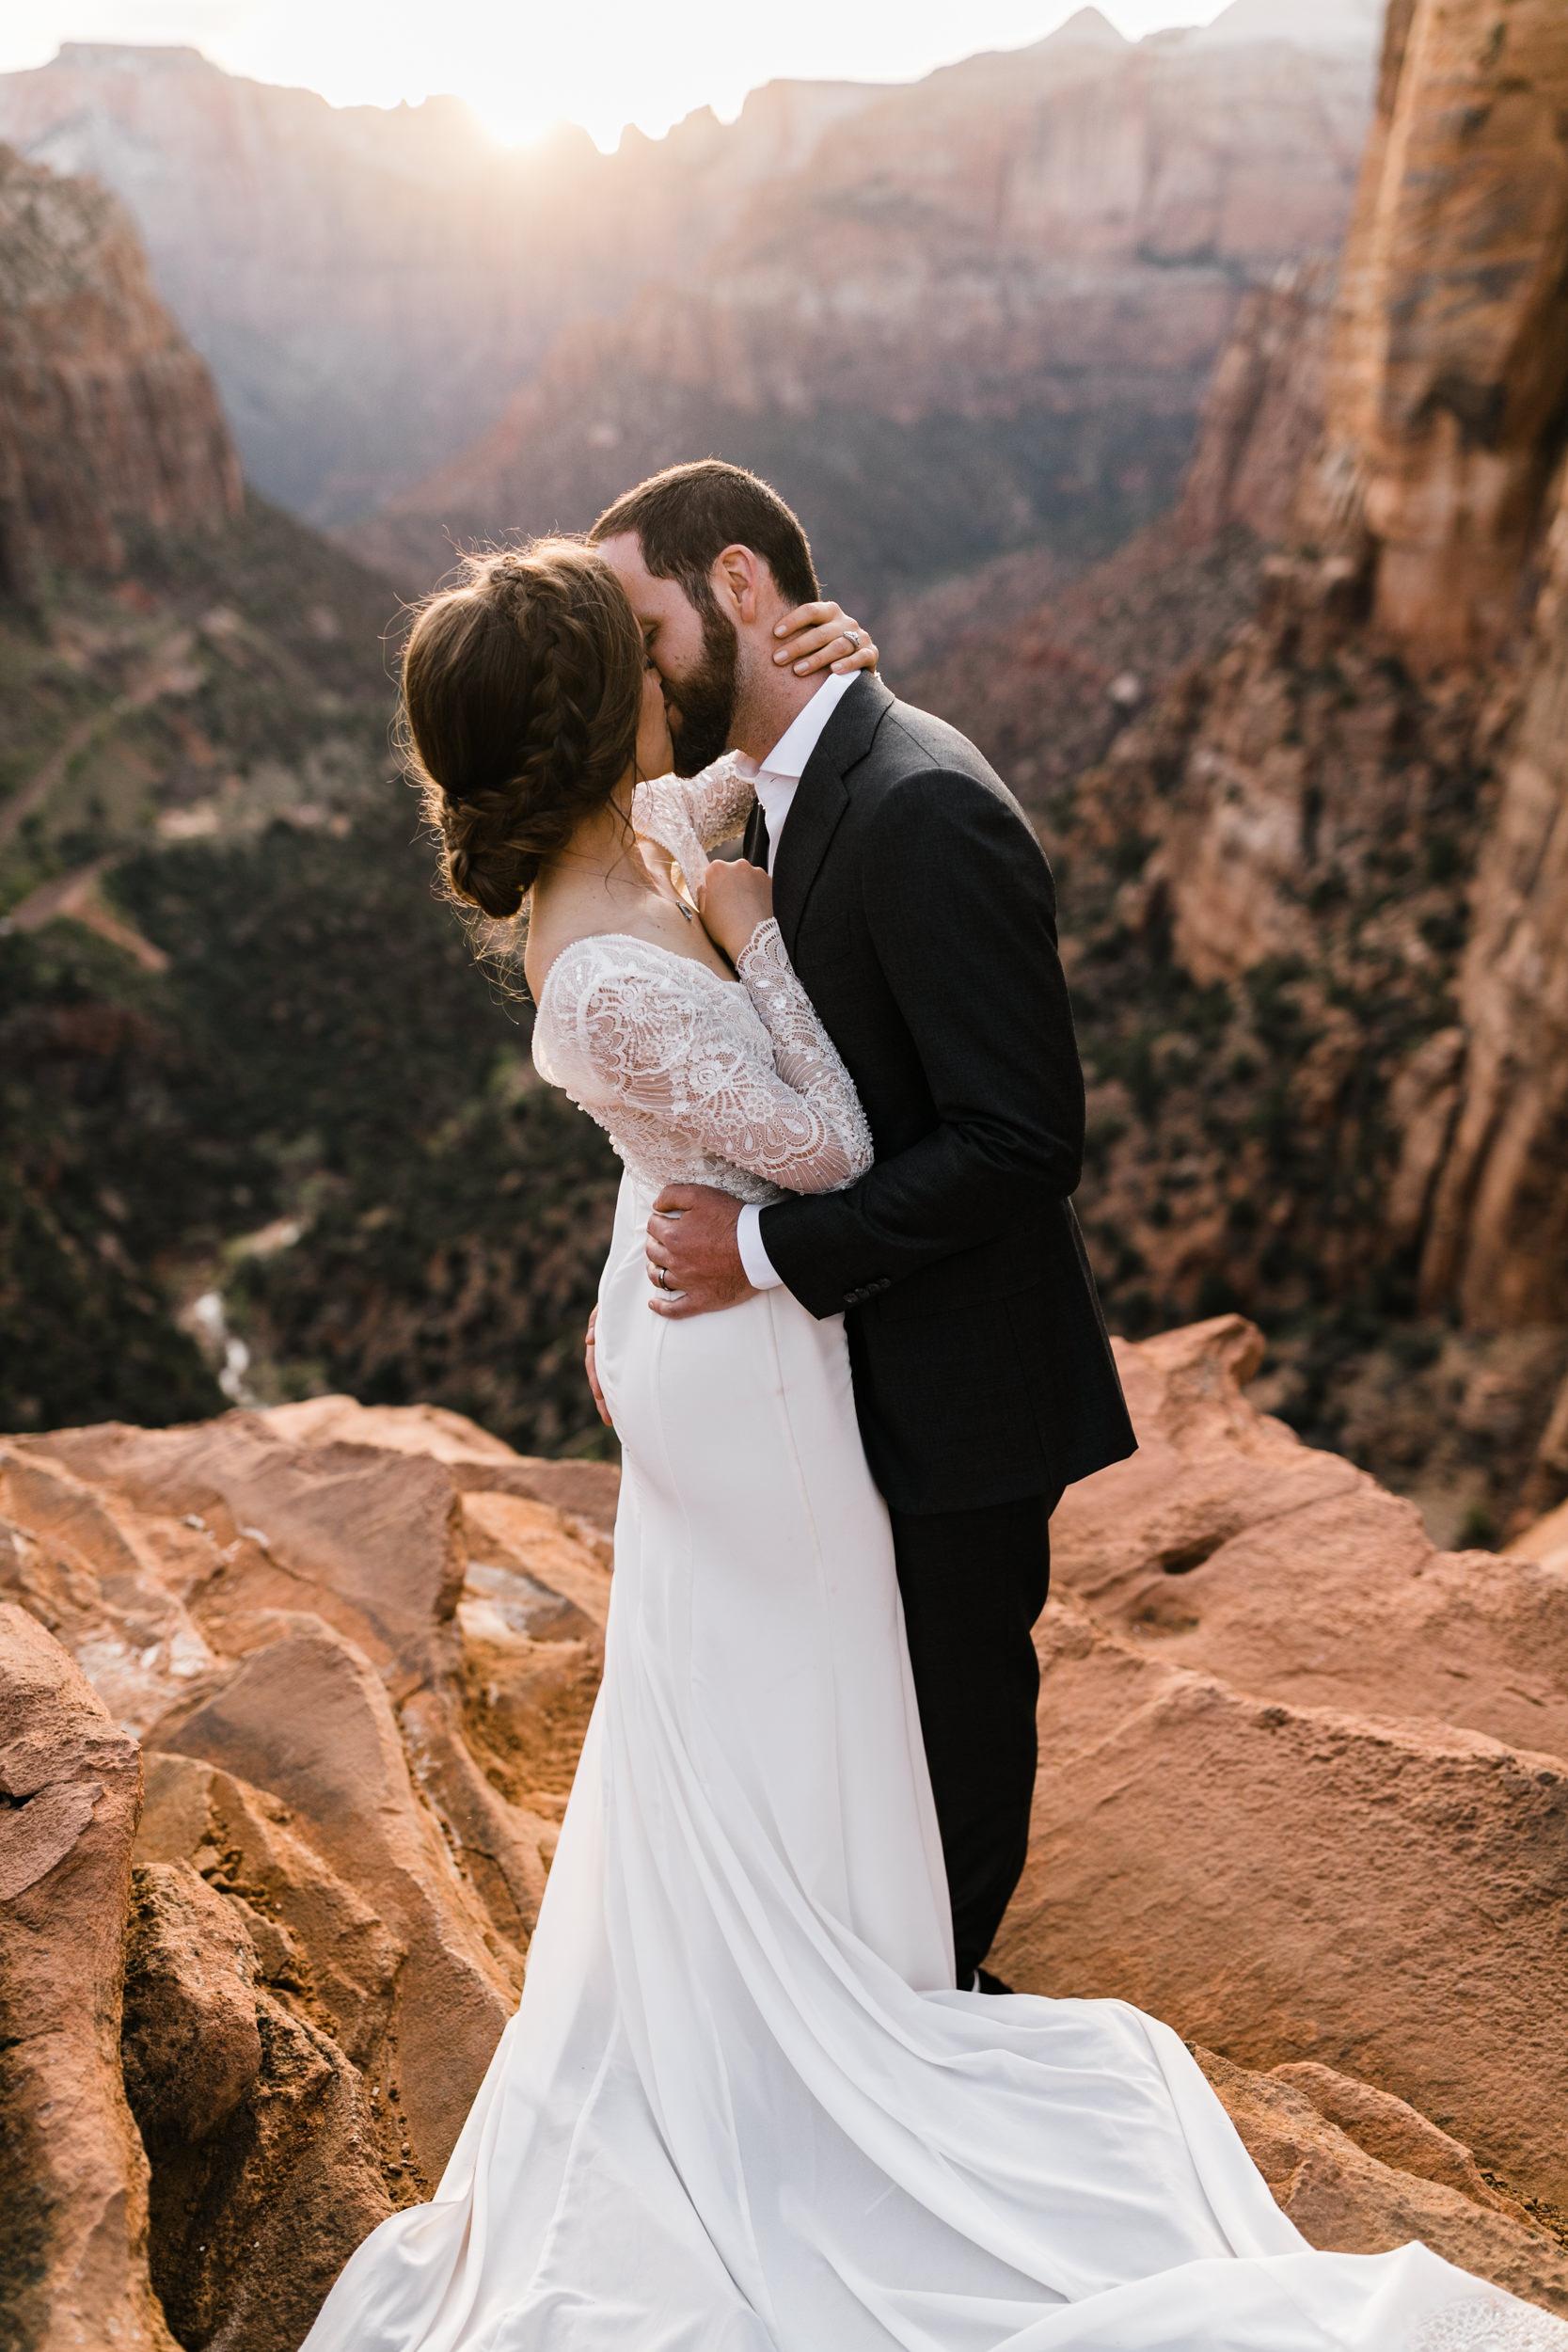 Zion-National-Park-Adventure-Wedding-Hearnes-Elopement-Photography-51.jpg